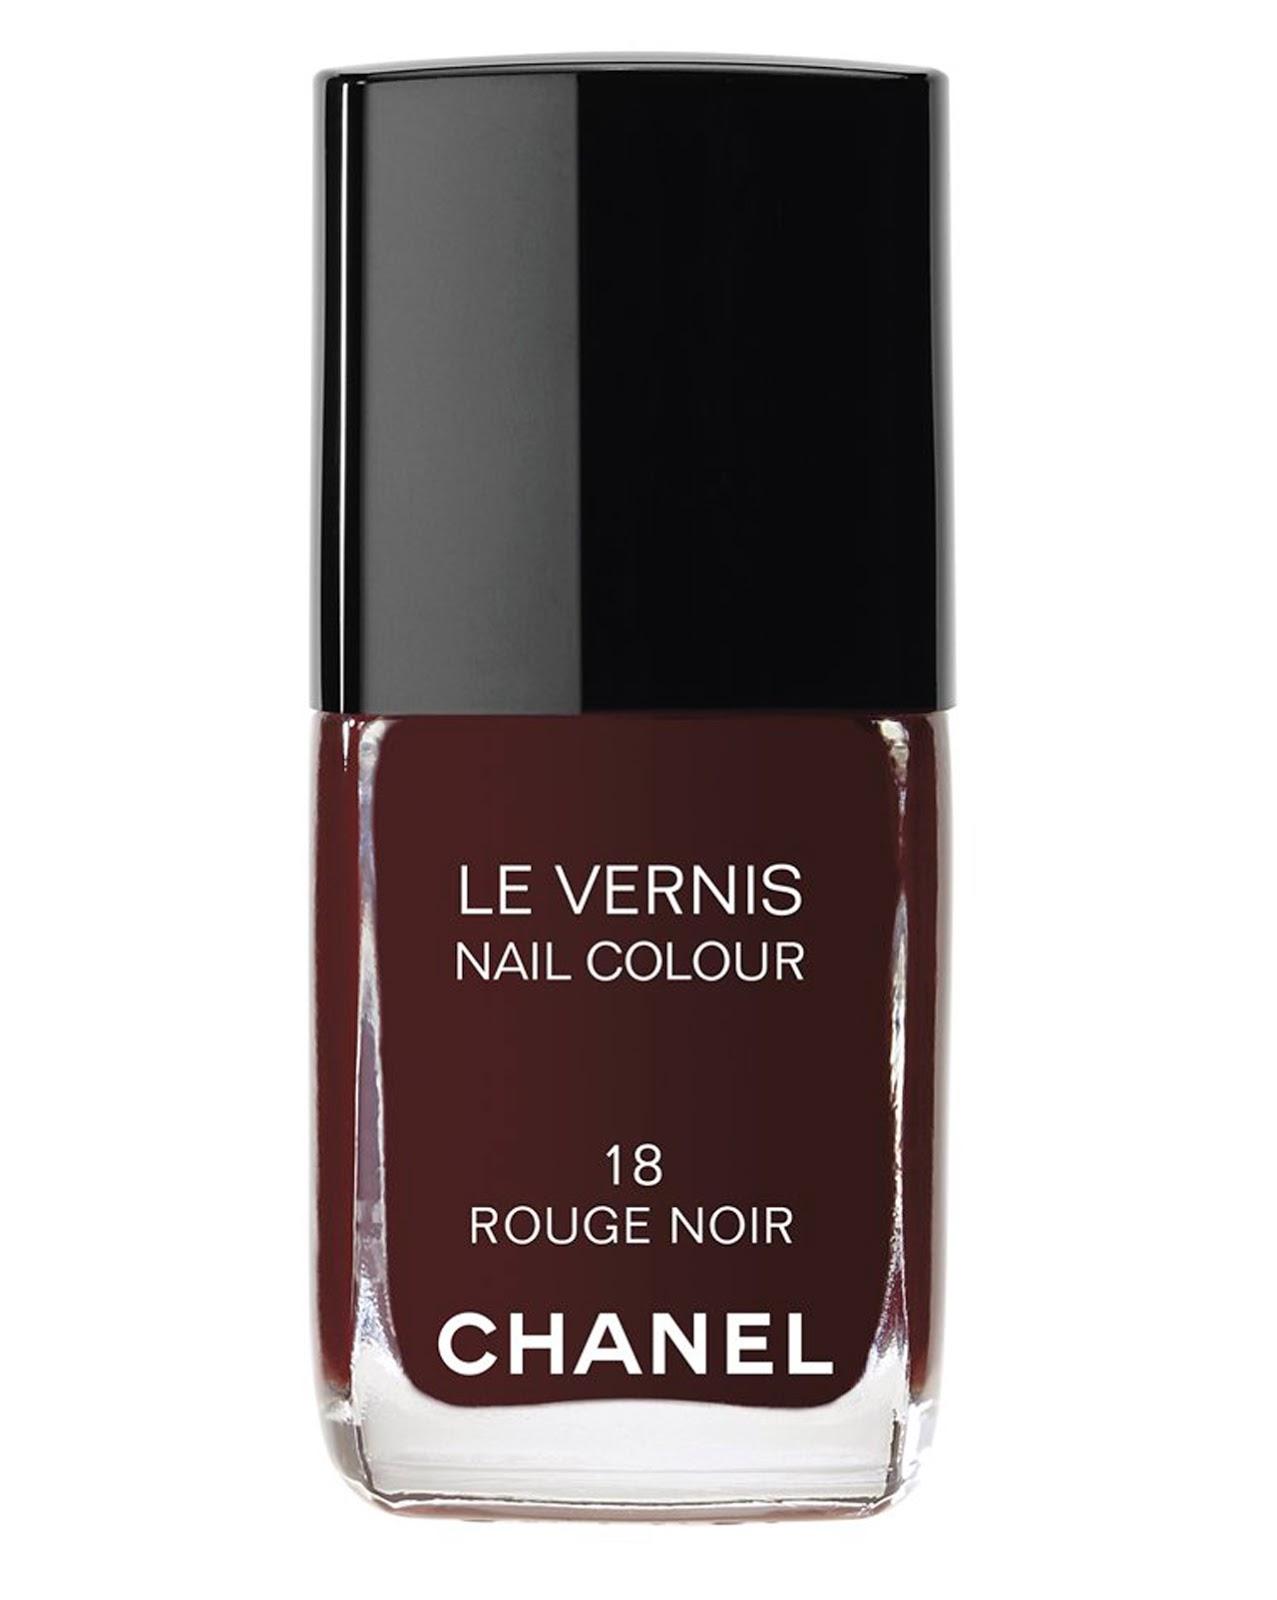 new chanel le vernis nail polish colour rouge noir 18 13 ml 0 4 fl oz ebay. Black Bedroom Furniture Sets. Home Design Ideas